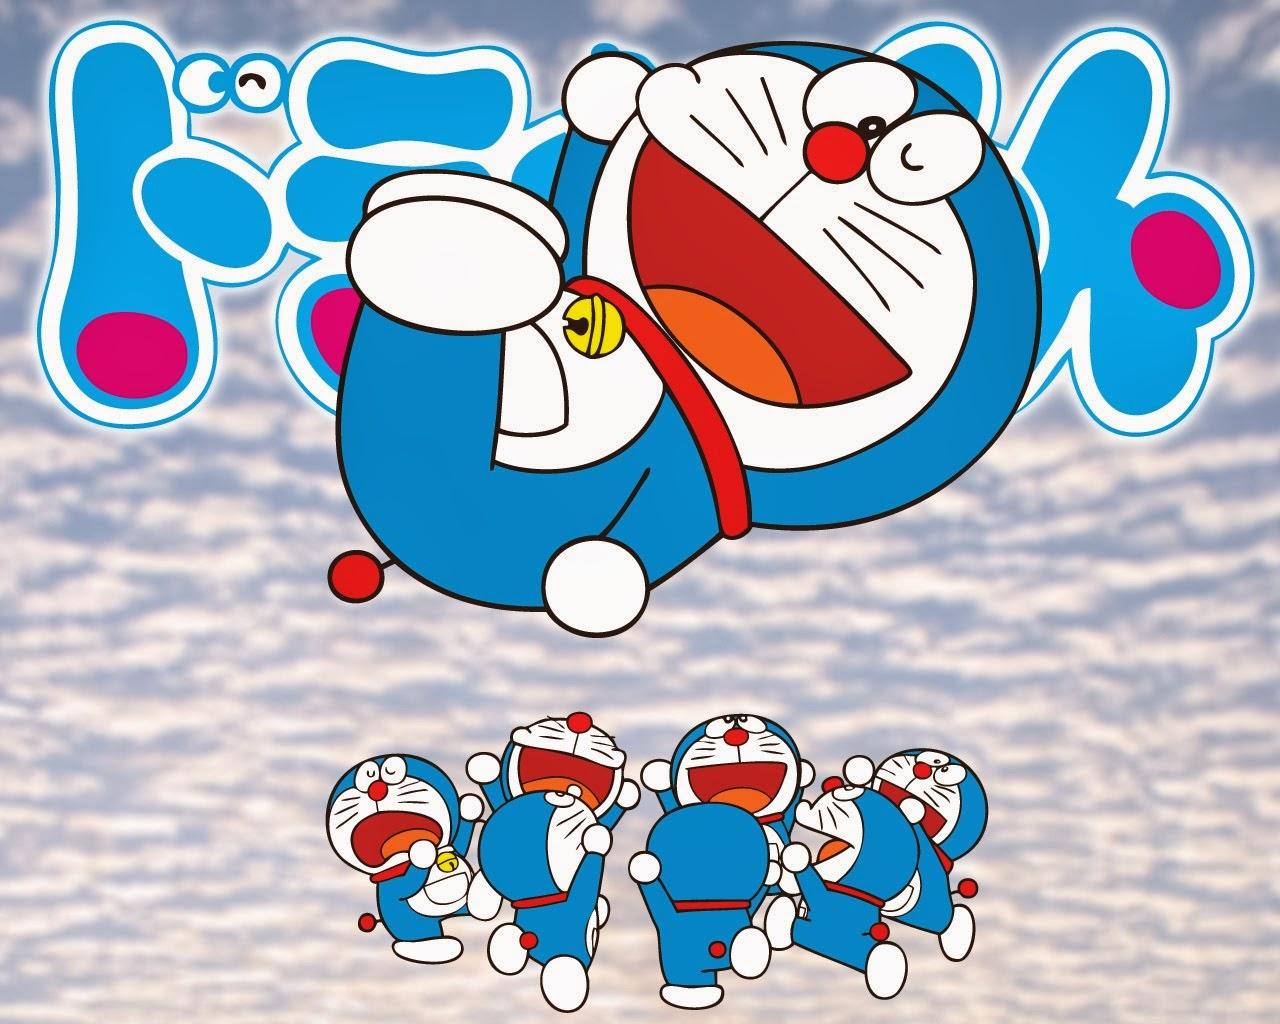 Acah Ucuh Akhir Dari Cerita Doraemon